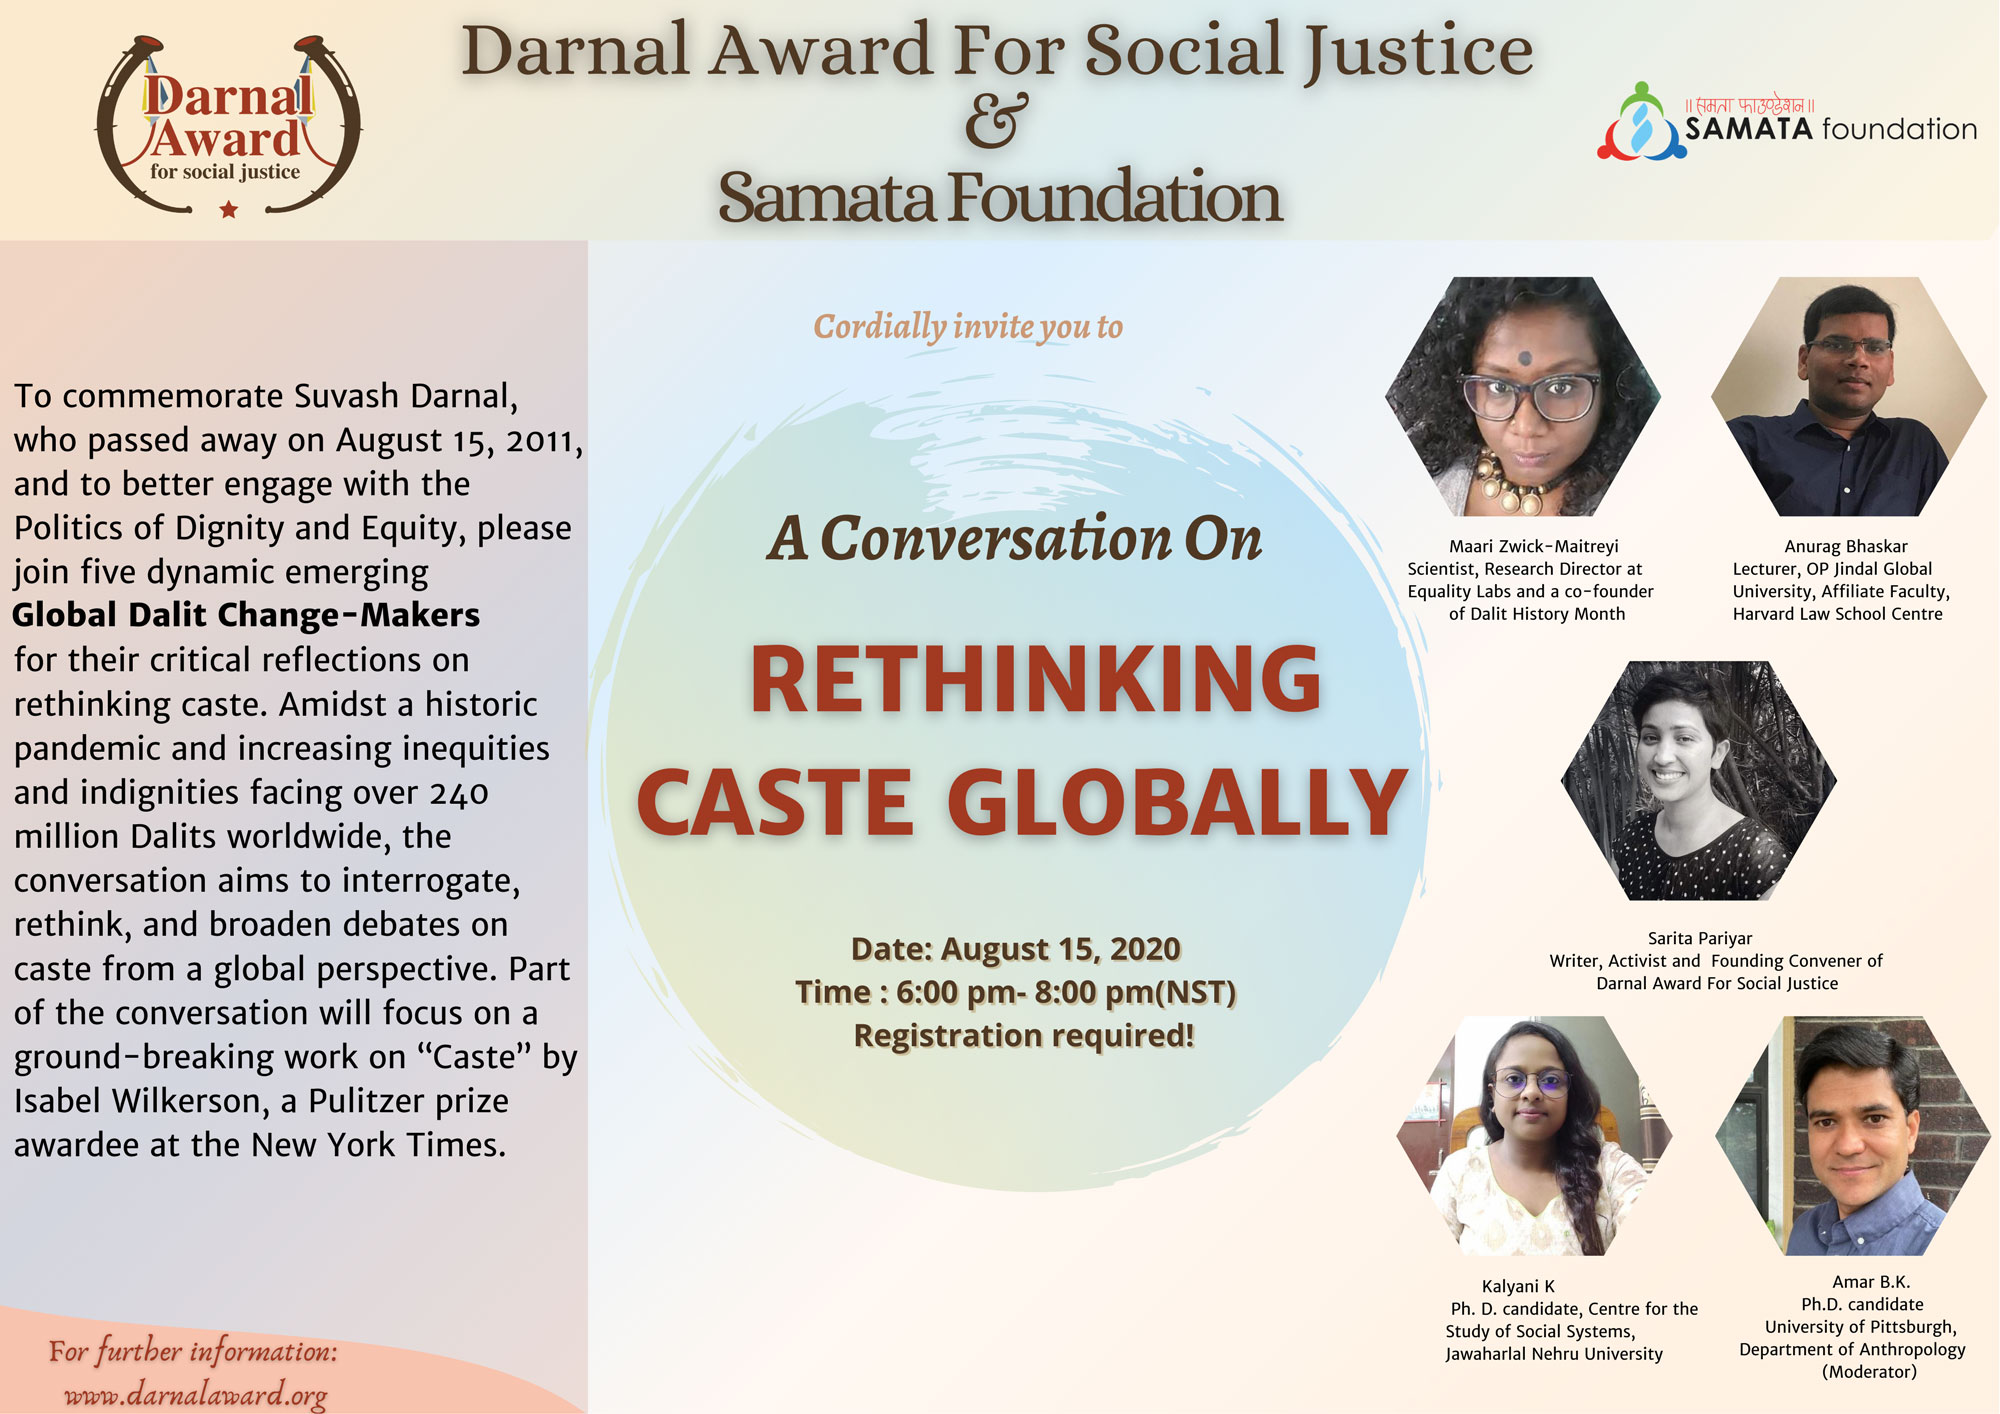 Rethinking Caste Globally